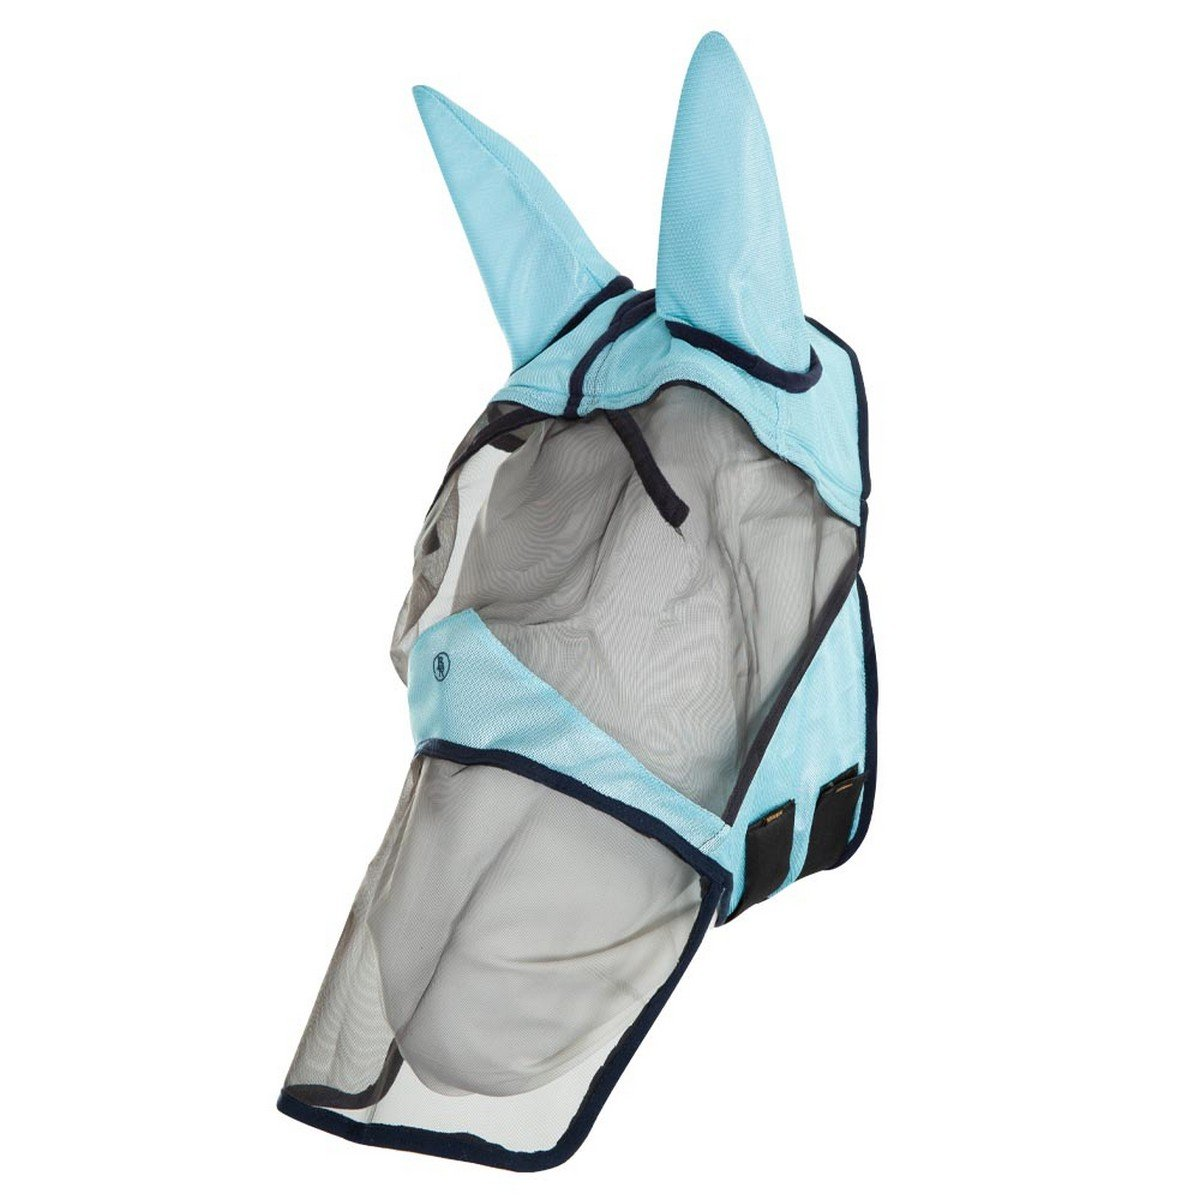 Imagem de BR Fly Mask Passion with Ears Porcelain Blue Pony